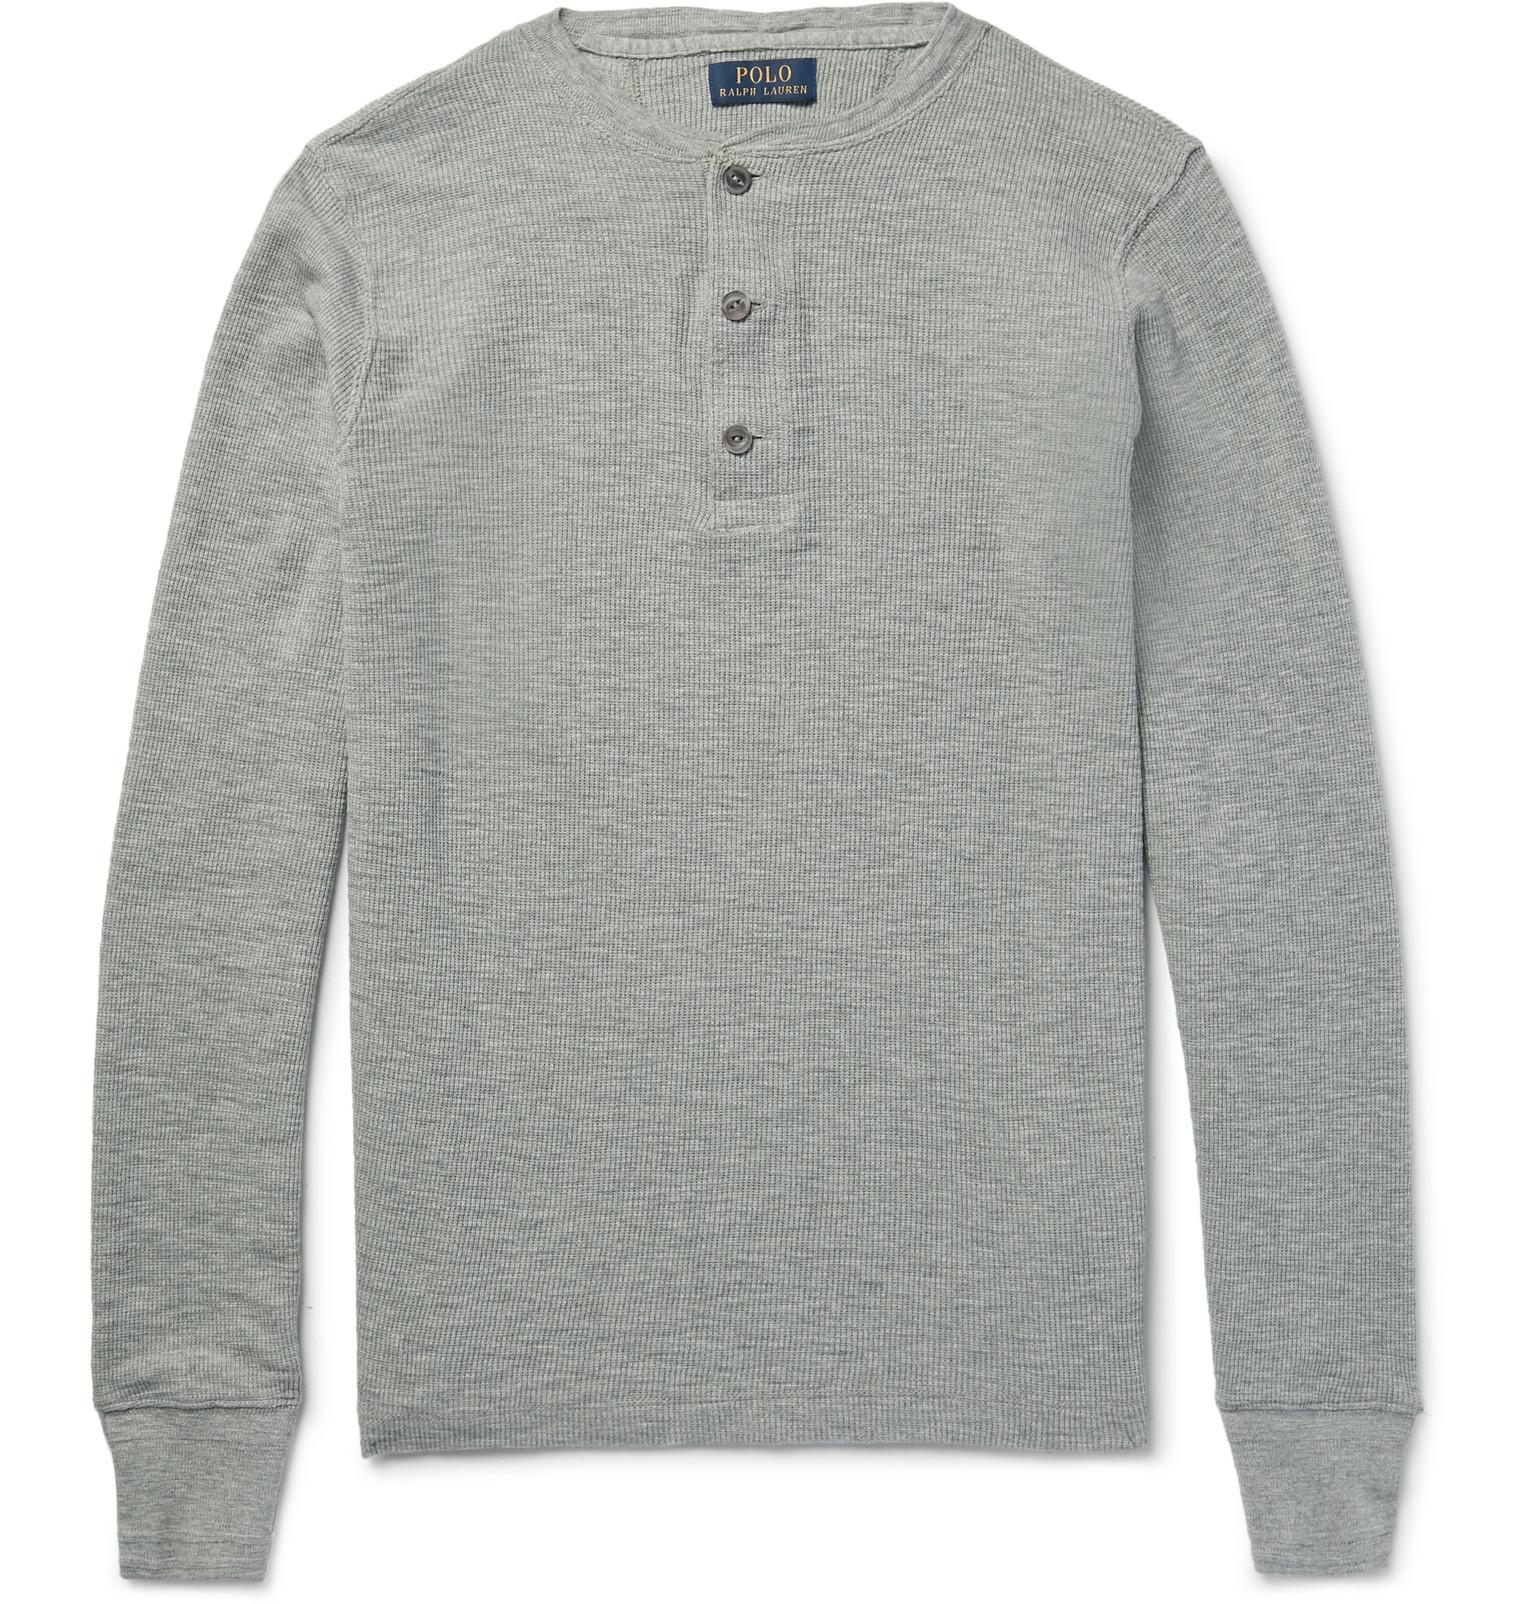 polo ralph lauren waffle knit cotton henley t shirt in